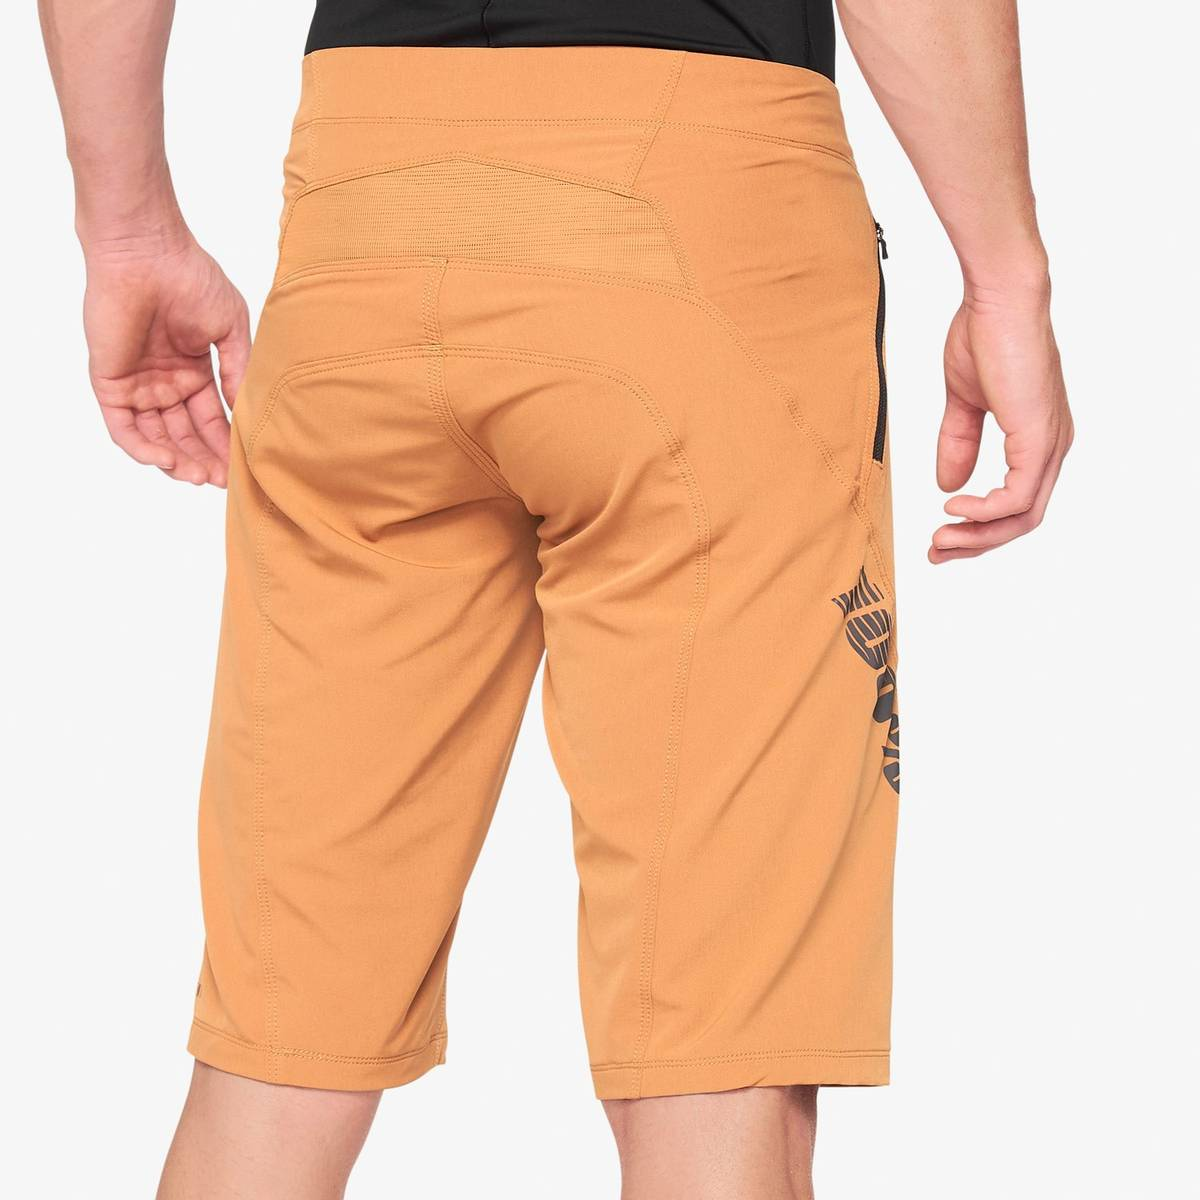 100% AIRMATIC Shorts Caramel